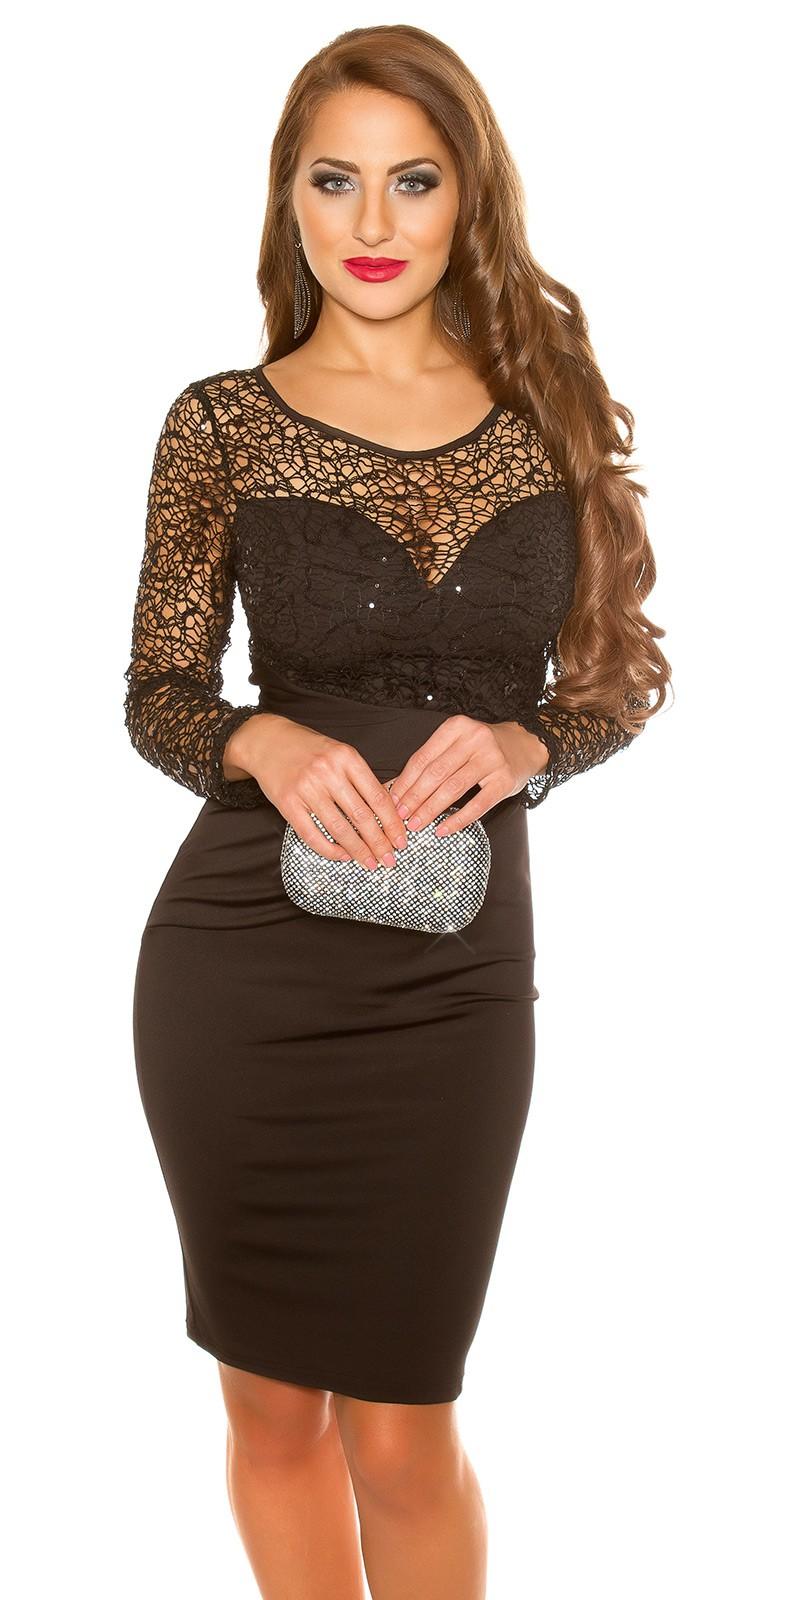 ookoucla partydress with lace  sequins  Color BLACK Size M 0000K19435 SCHWARZ 23 1.  Cierne spolocenske saty b7ec770261f